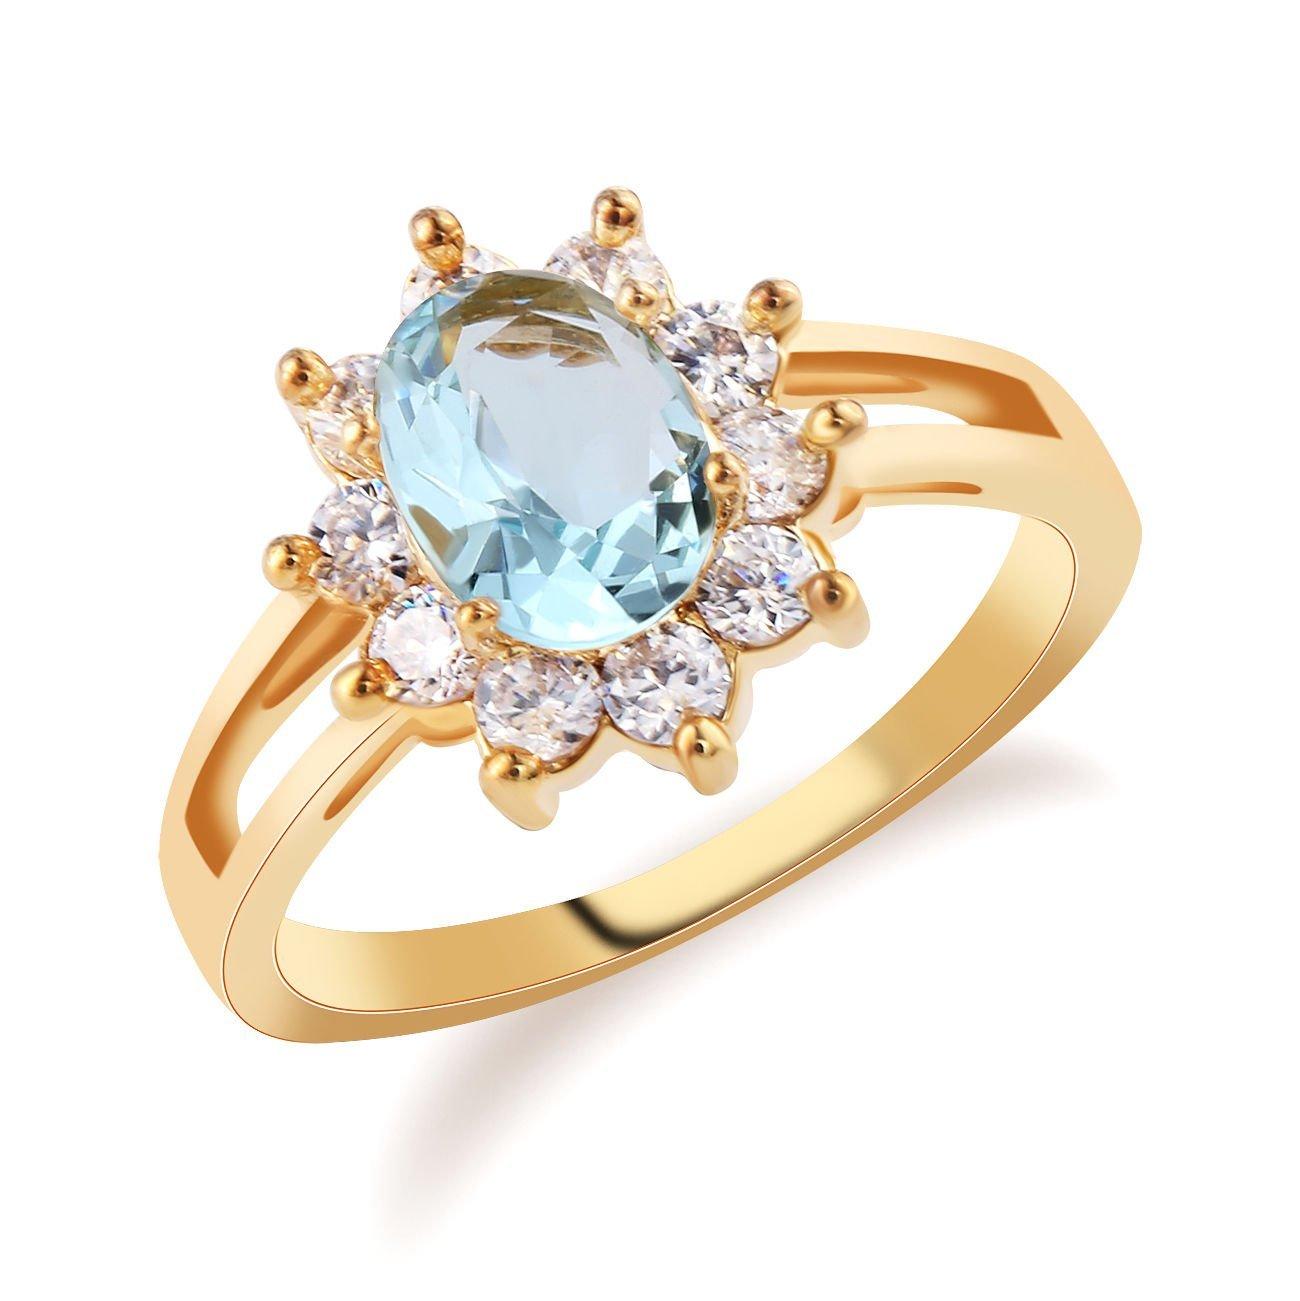 Cheap Sapphire Enement Rings | Cheap Light Blue Sapphire Engagement Rings Find Light Blue Sapphire